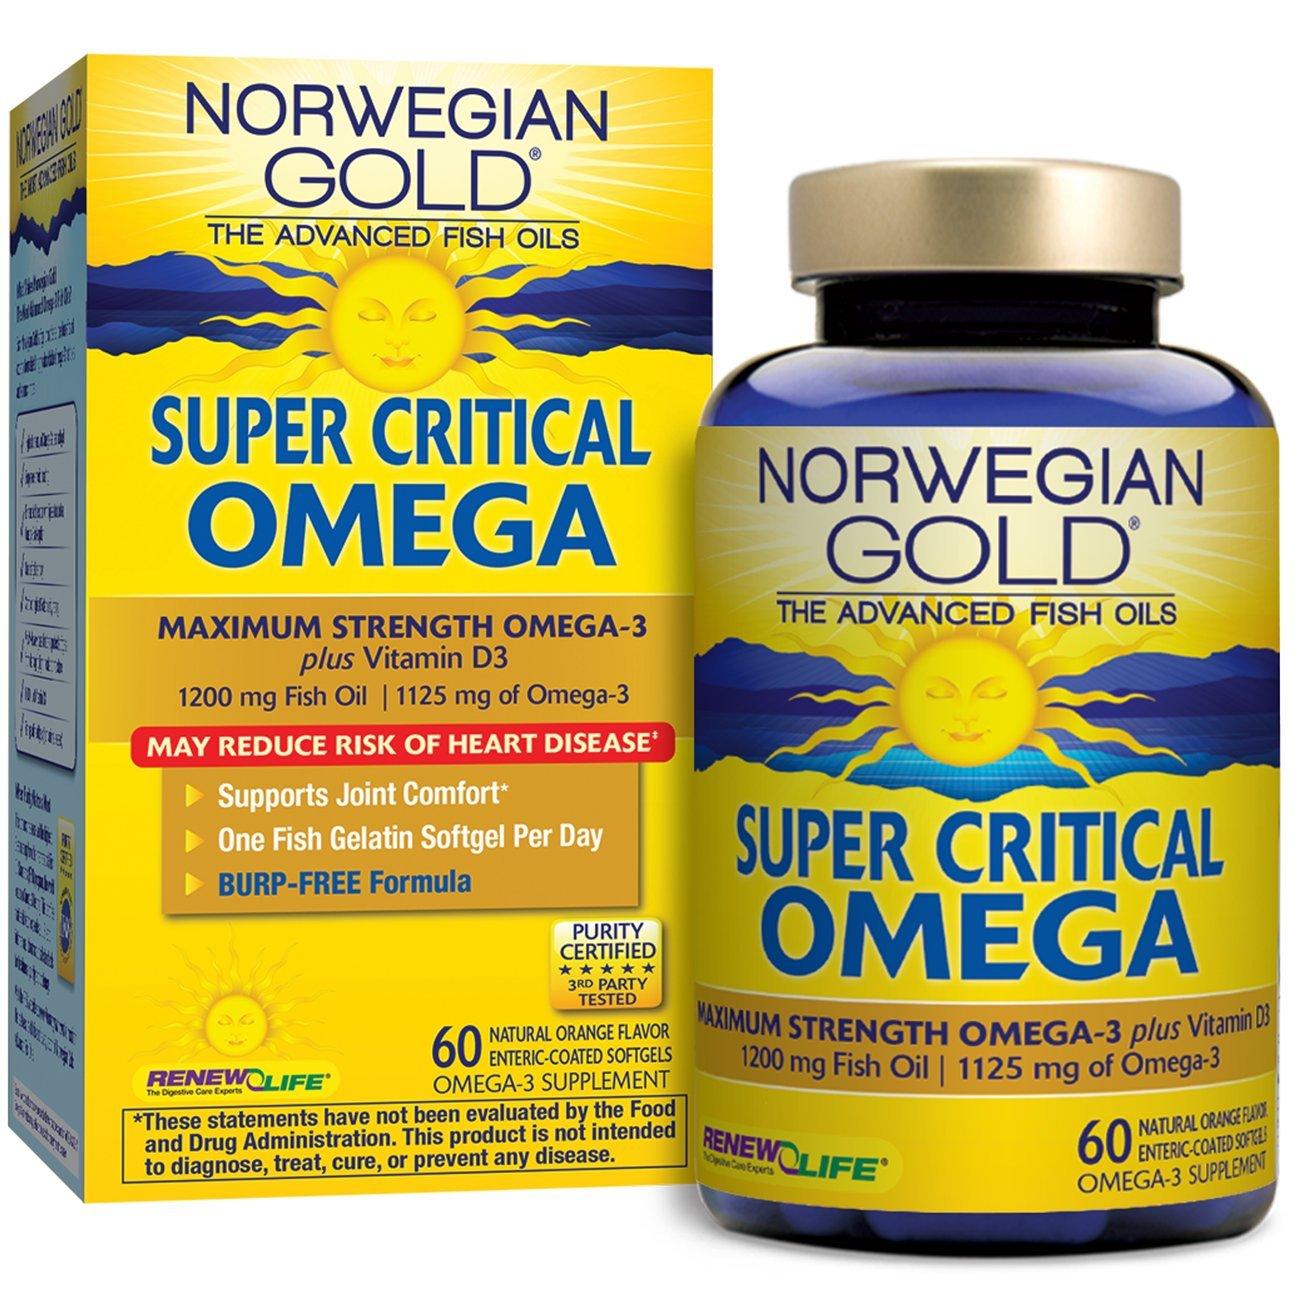 Norwegian Gold - Super Critical Omega - Omega 3 supplement - 60 softgel capsules - Renew Life brand